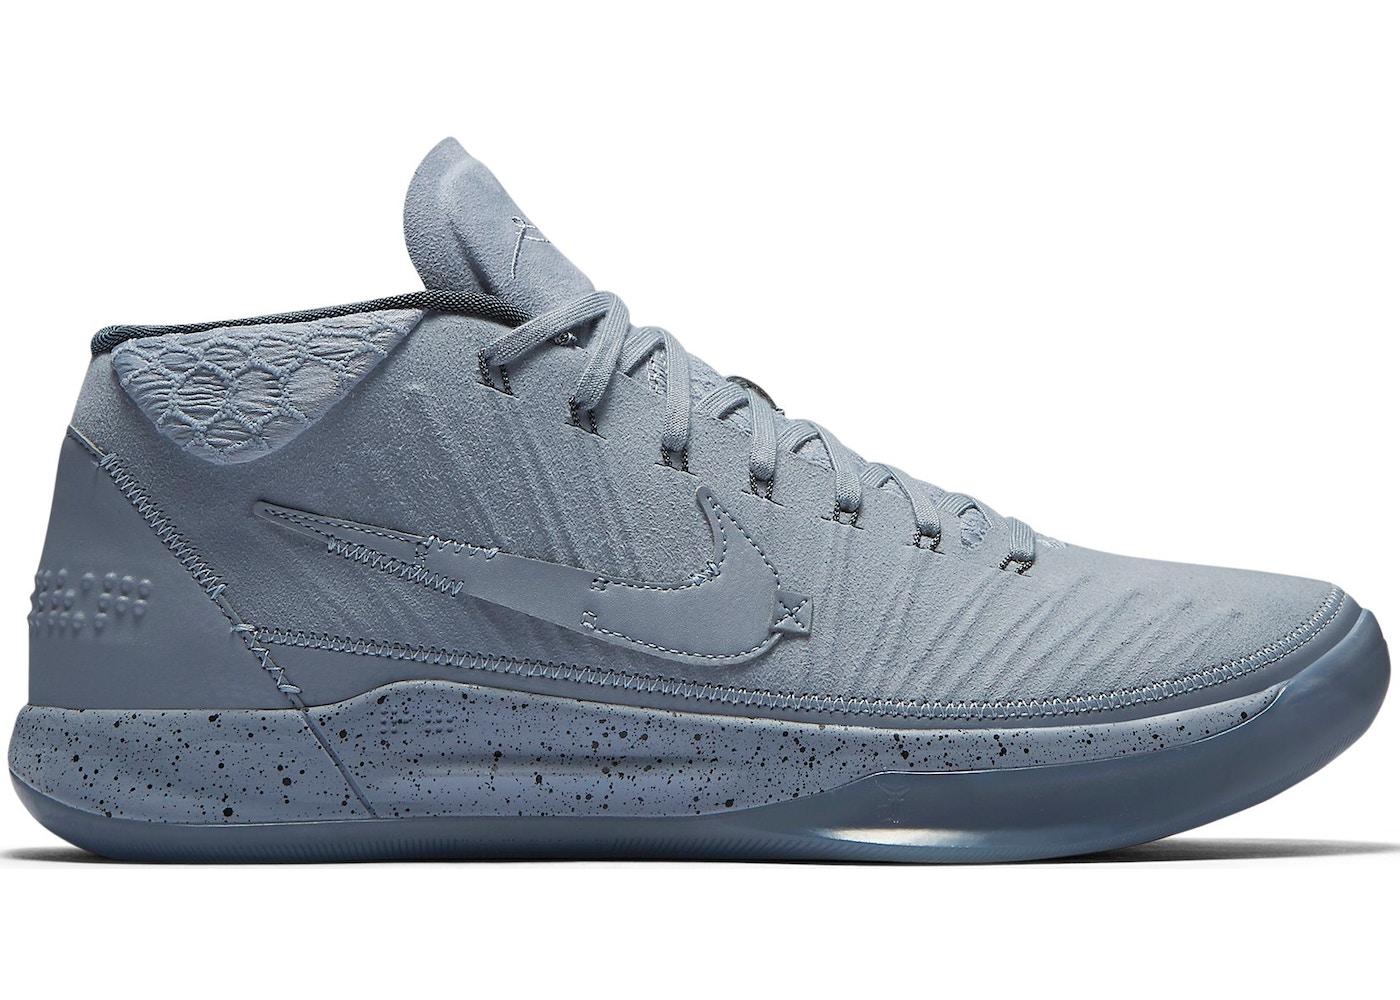 Nike Kobe A.D. Mid Detached - 922482-002